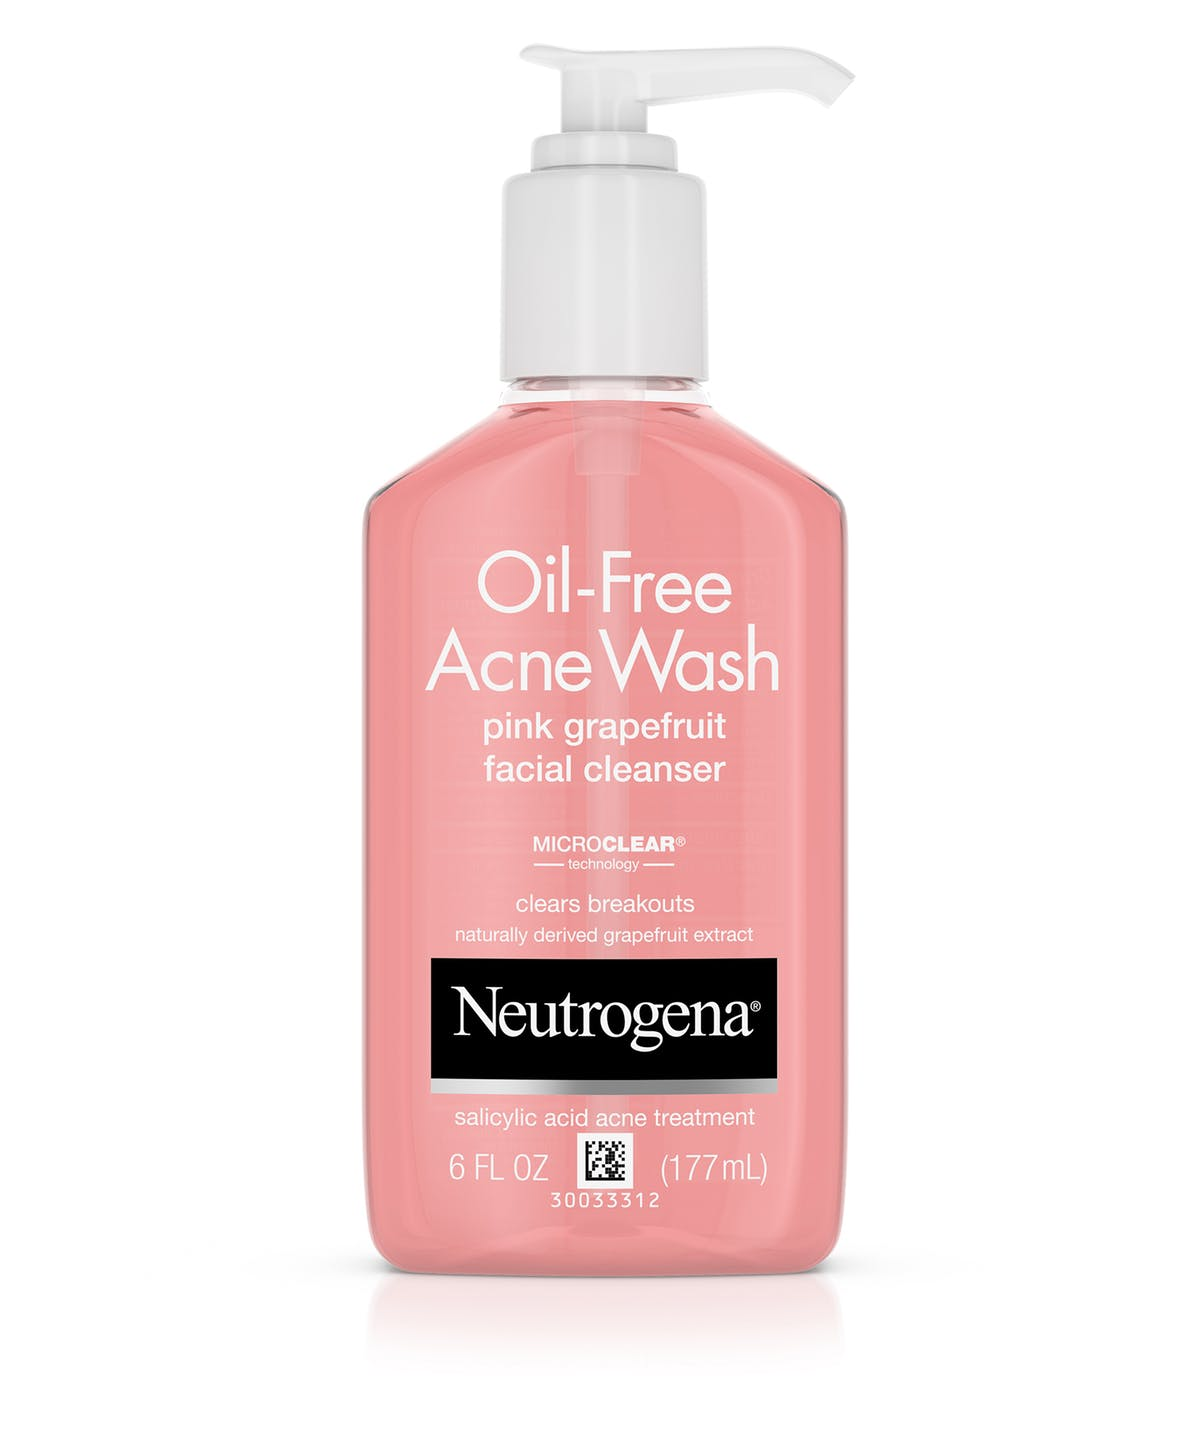 neutrogena oil free acne wash grapefruit drugstore cleanser